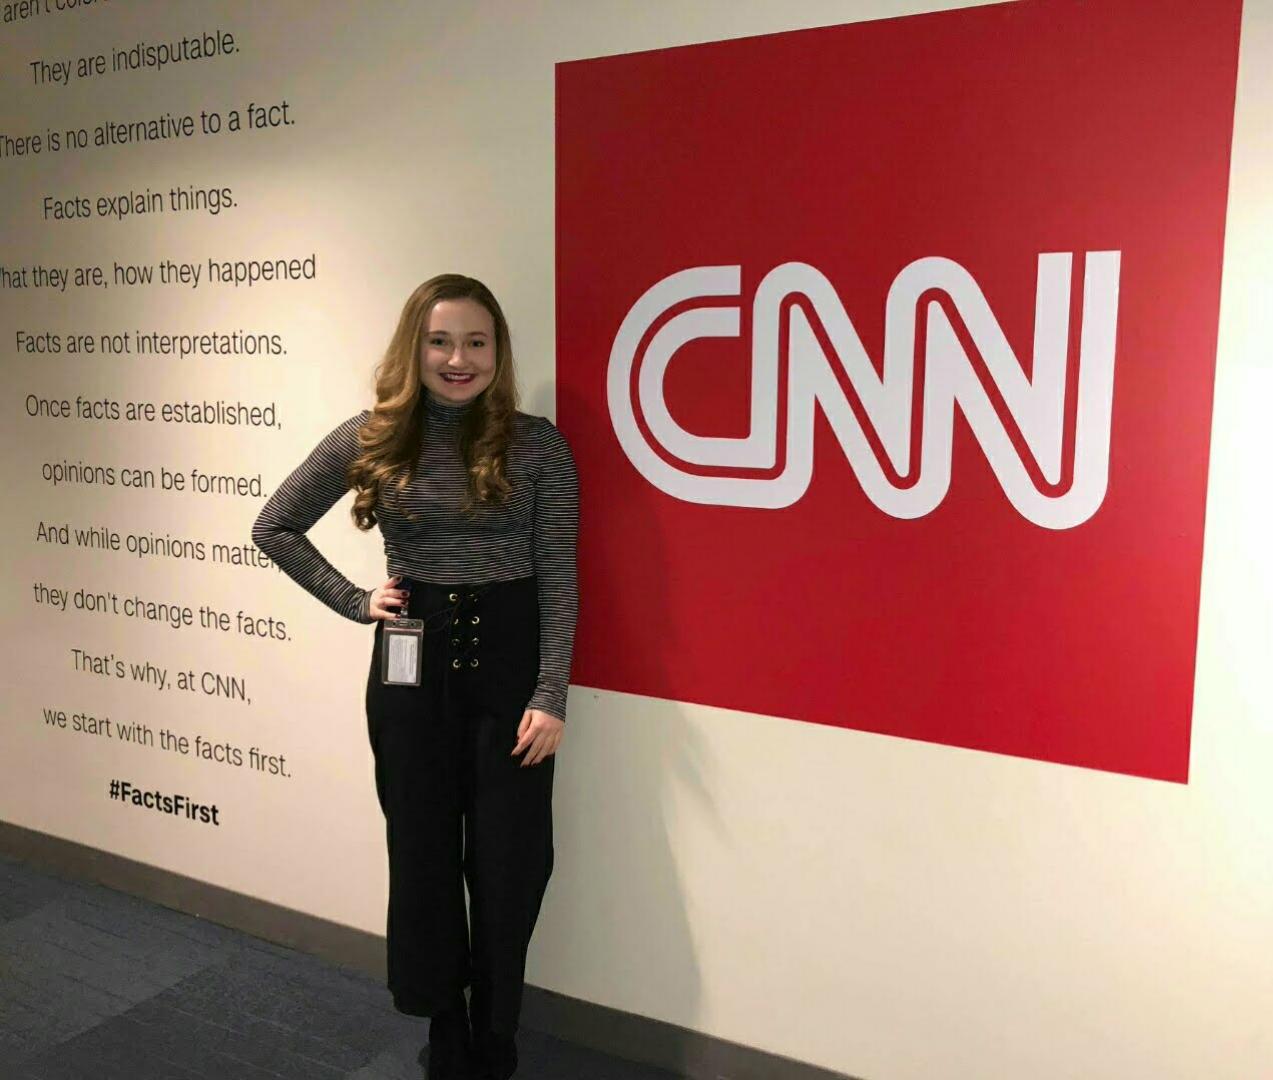 Annmarie Gajdos in front of CNN logo-wall